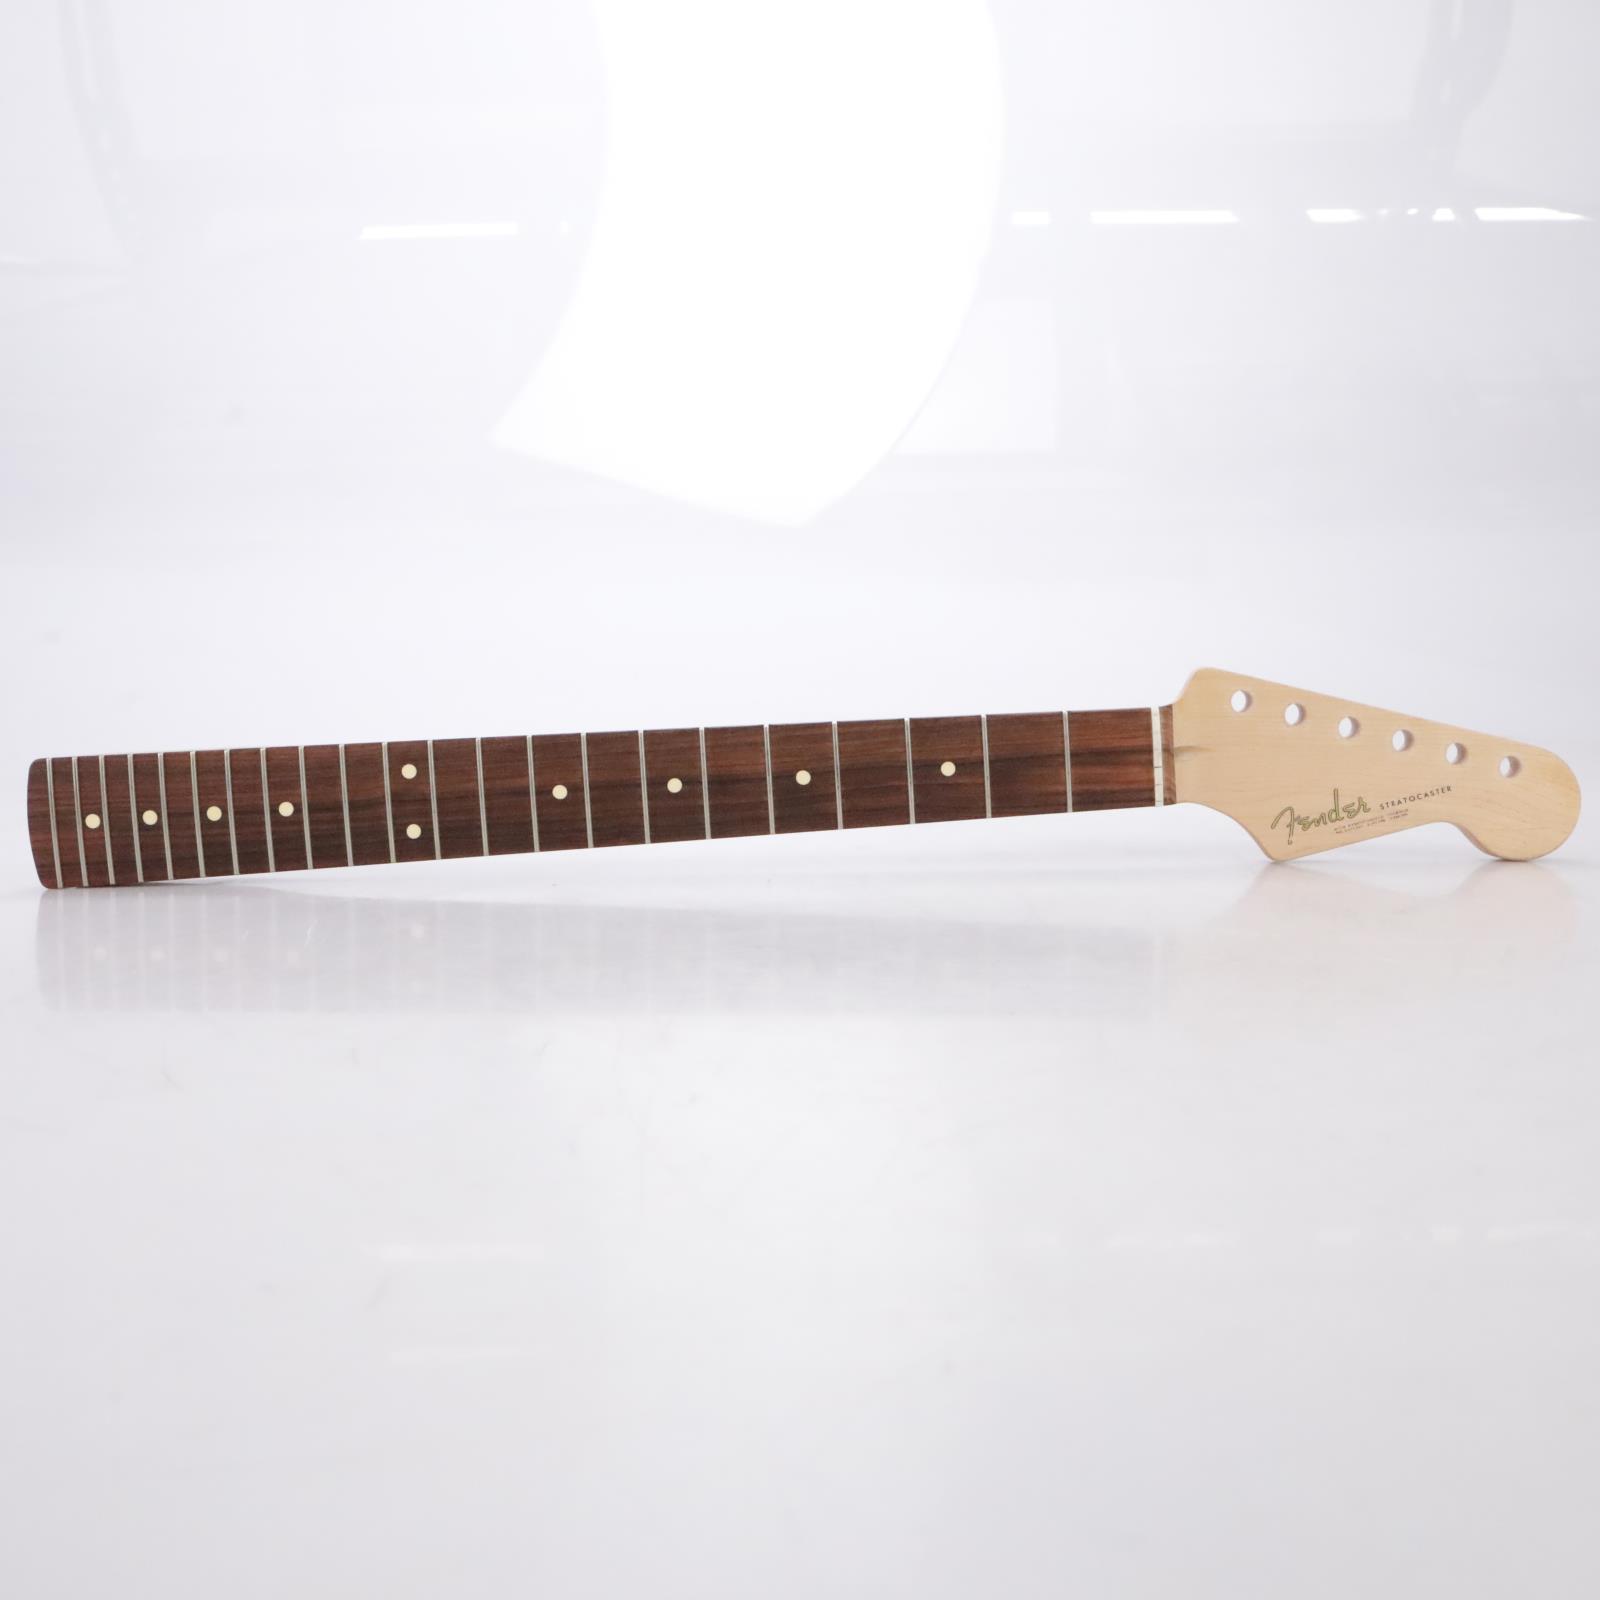 USA Custom Guitars 22 Fret Rosewood Stratocaster Guitar Neck #44305